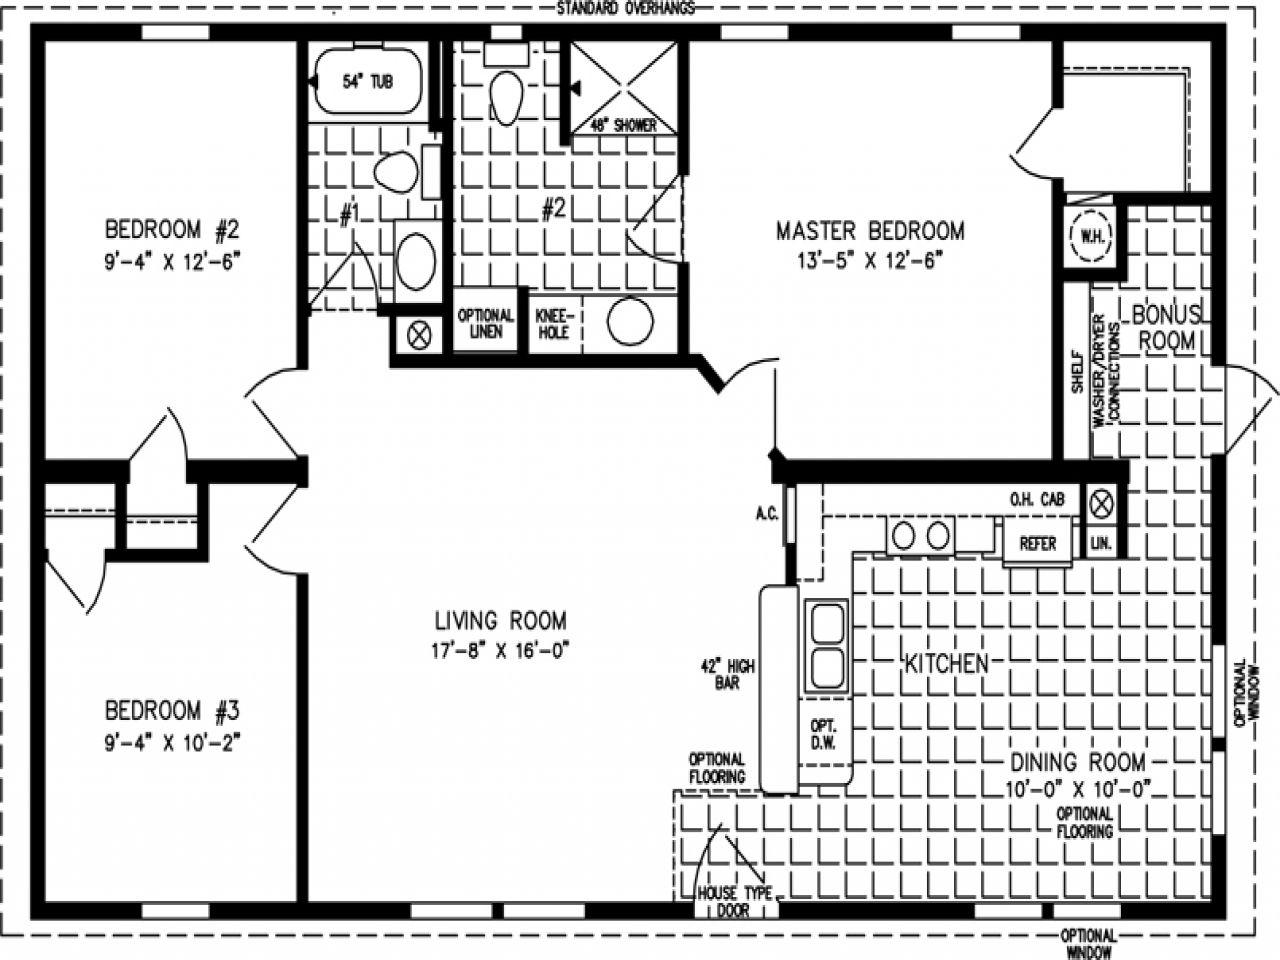 House Floor Plans House Floor Plans Under 1000 Sq Ft 1000